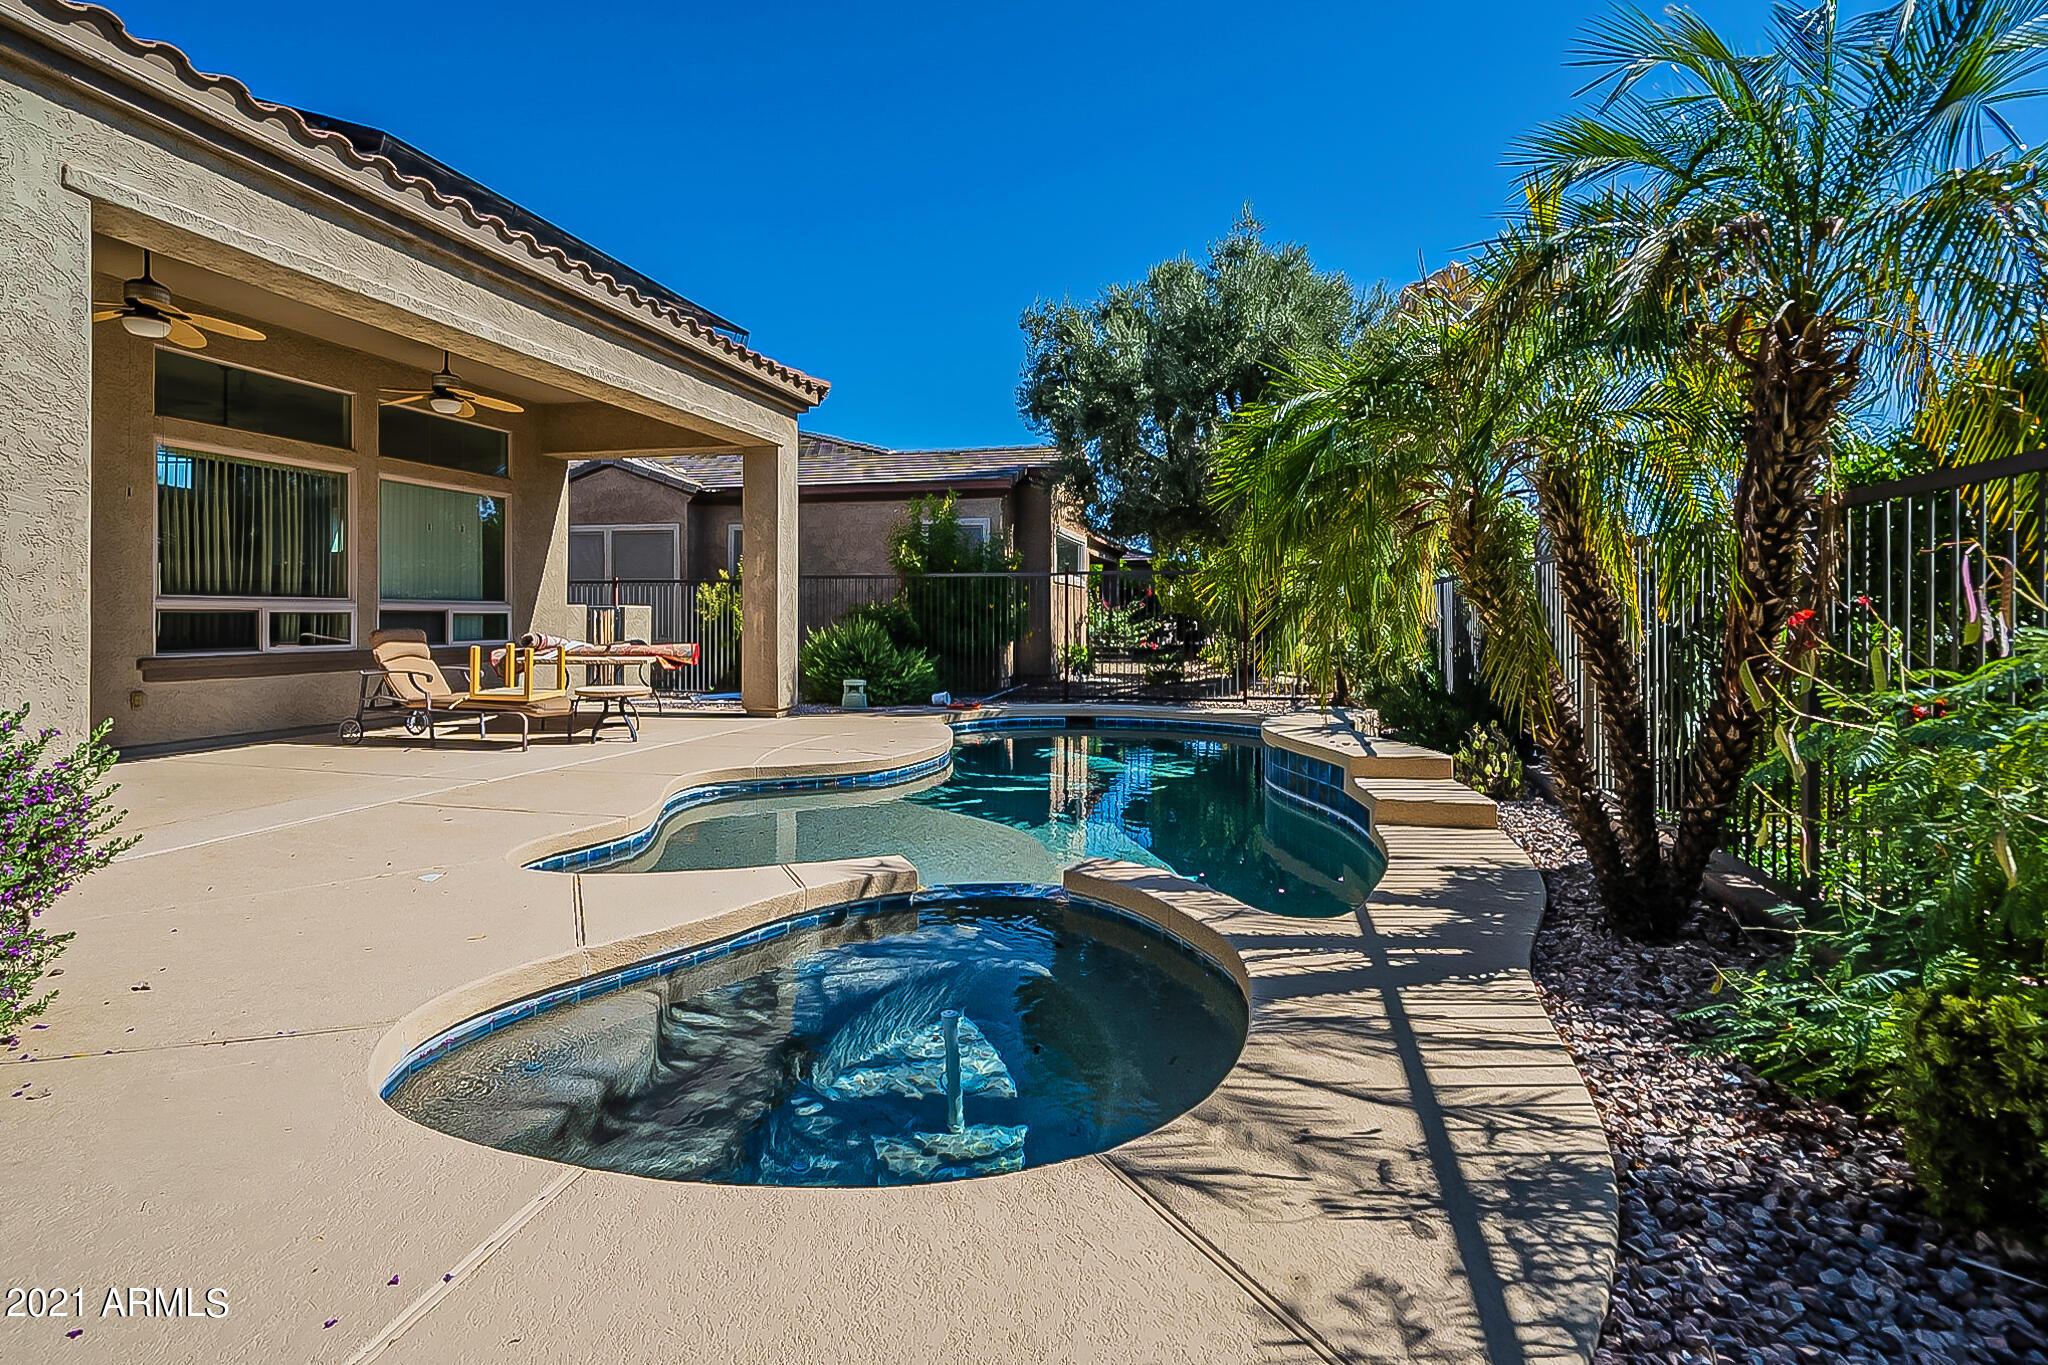 MLS 6307552 12801 W BAJADA Road, Peoria, AZ 85383 Peoria AZ Adult Community